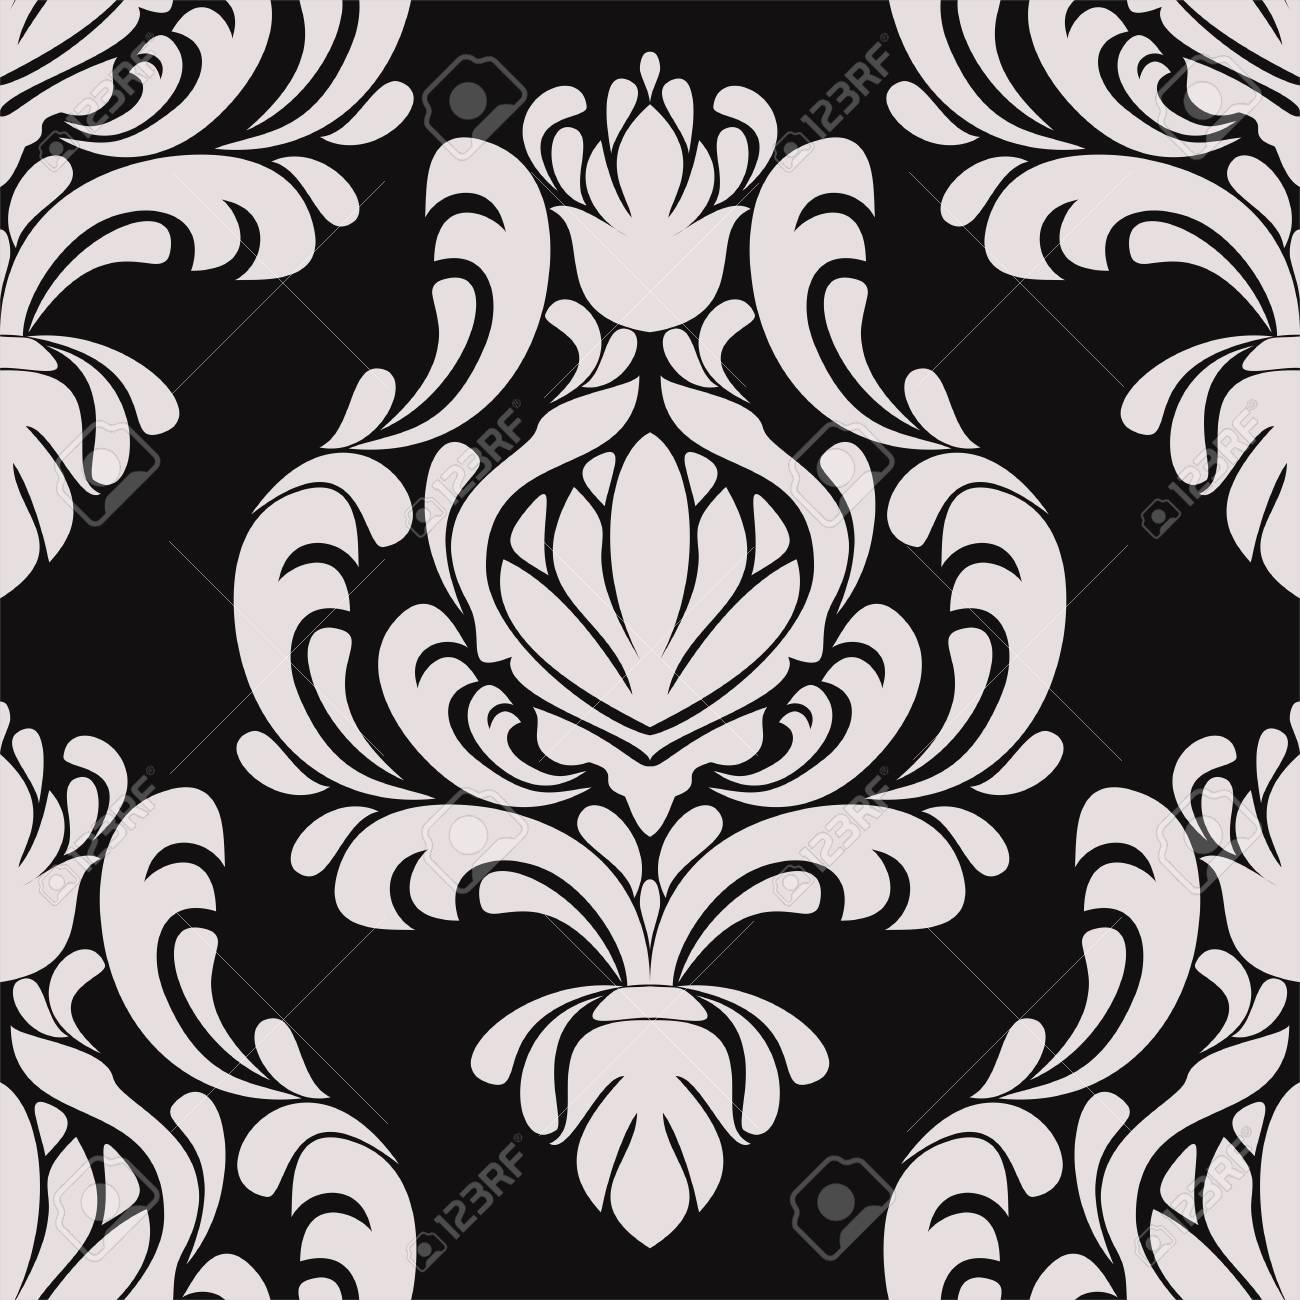 Seamless damask floral Ornament on black - 103610160